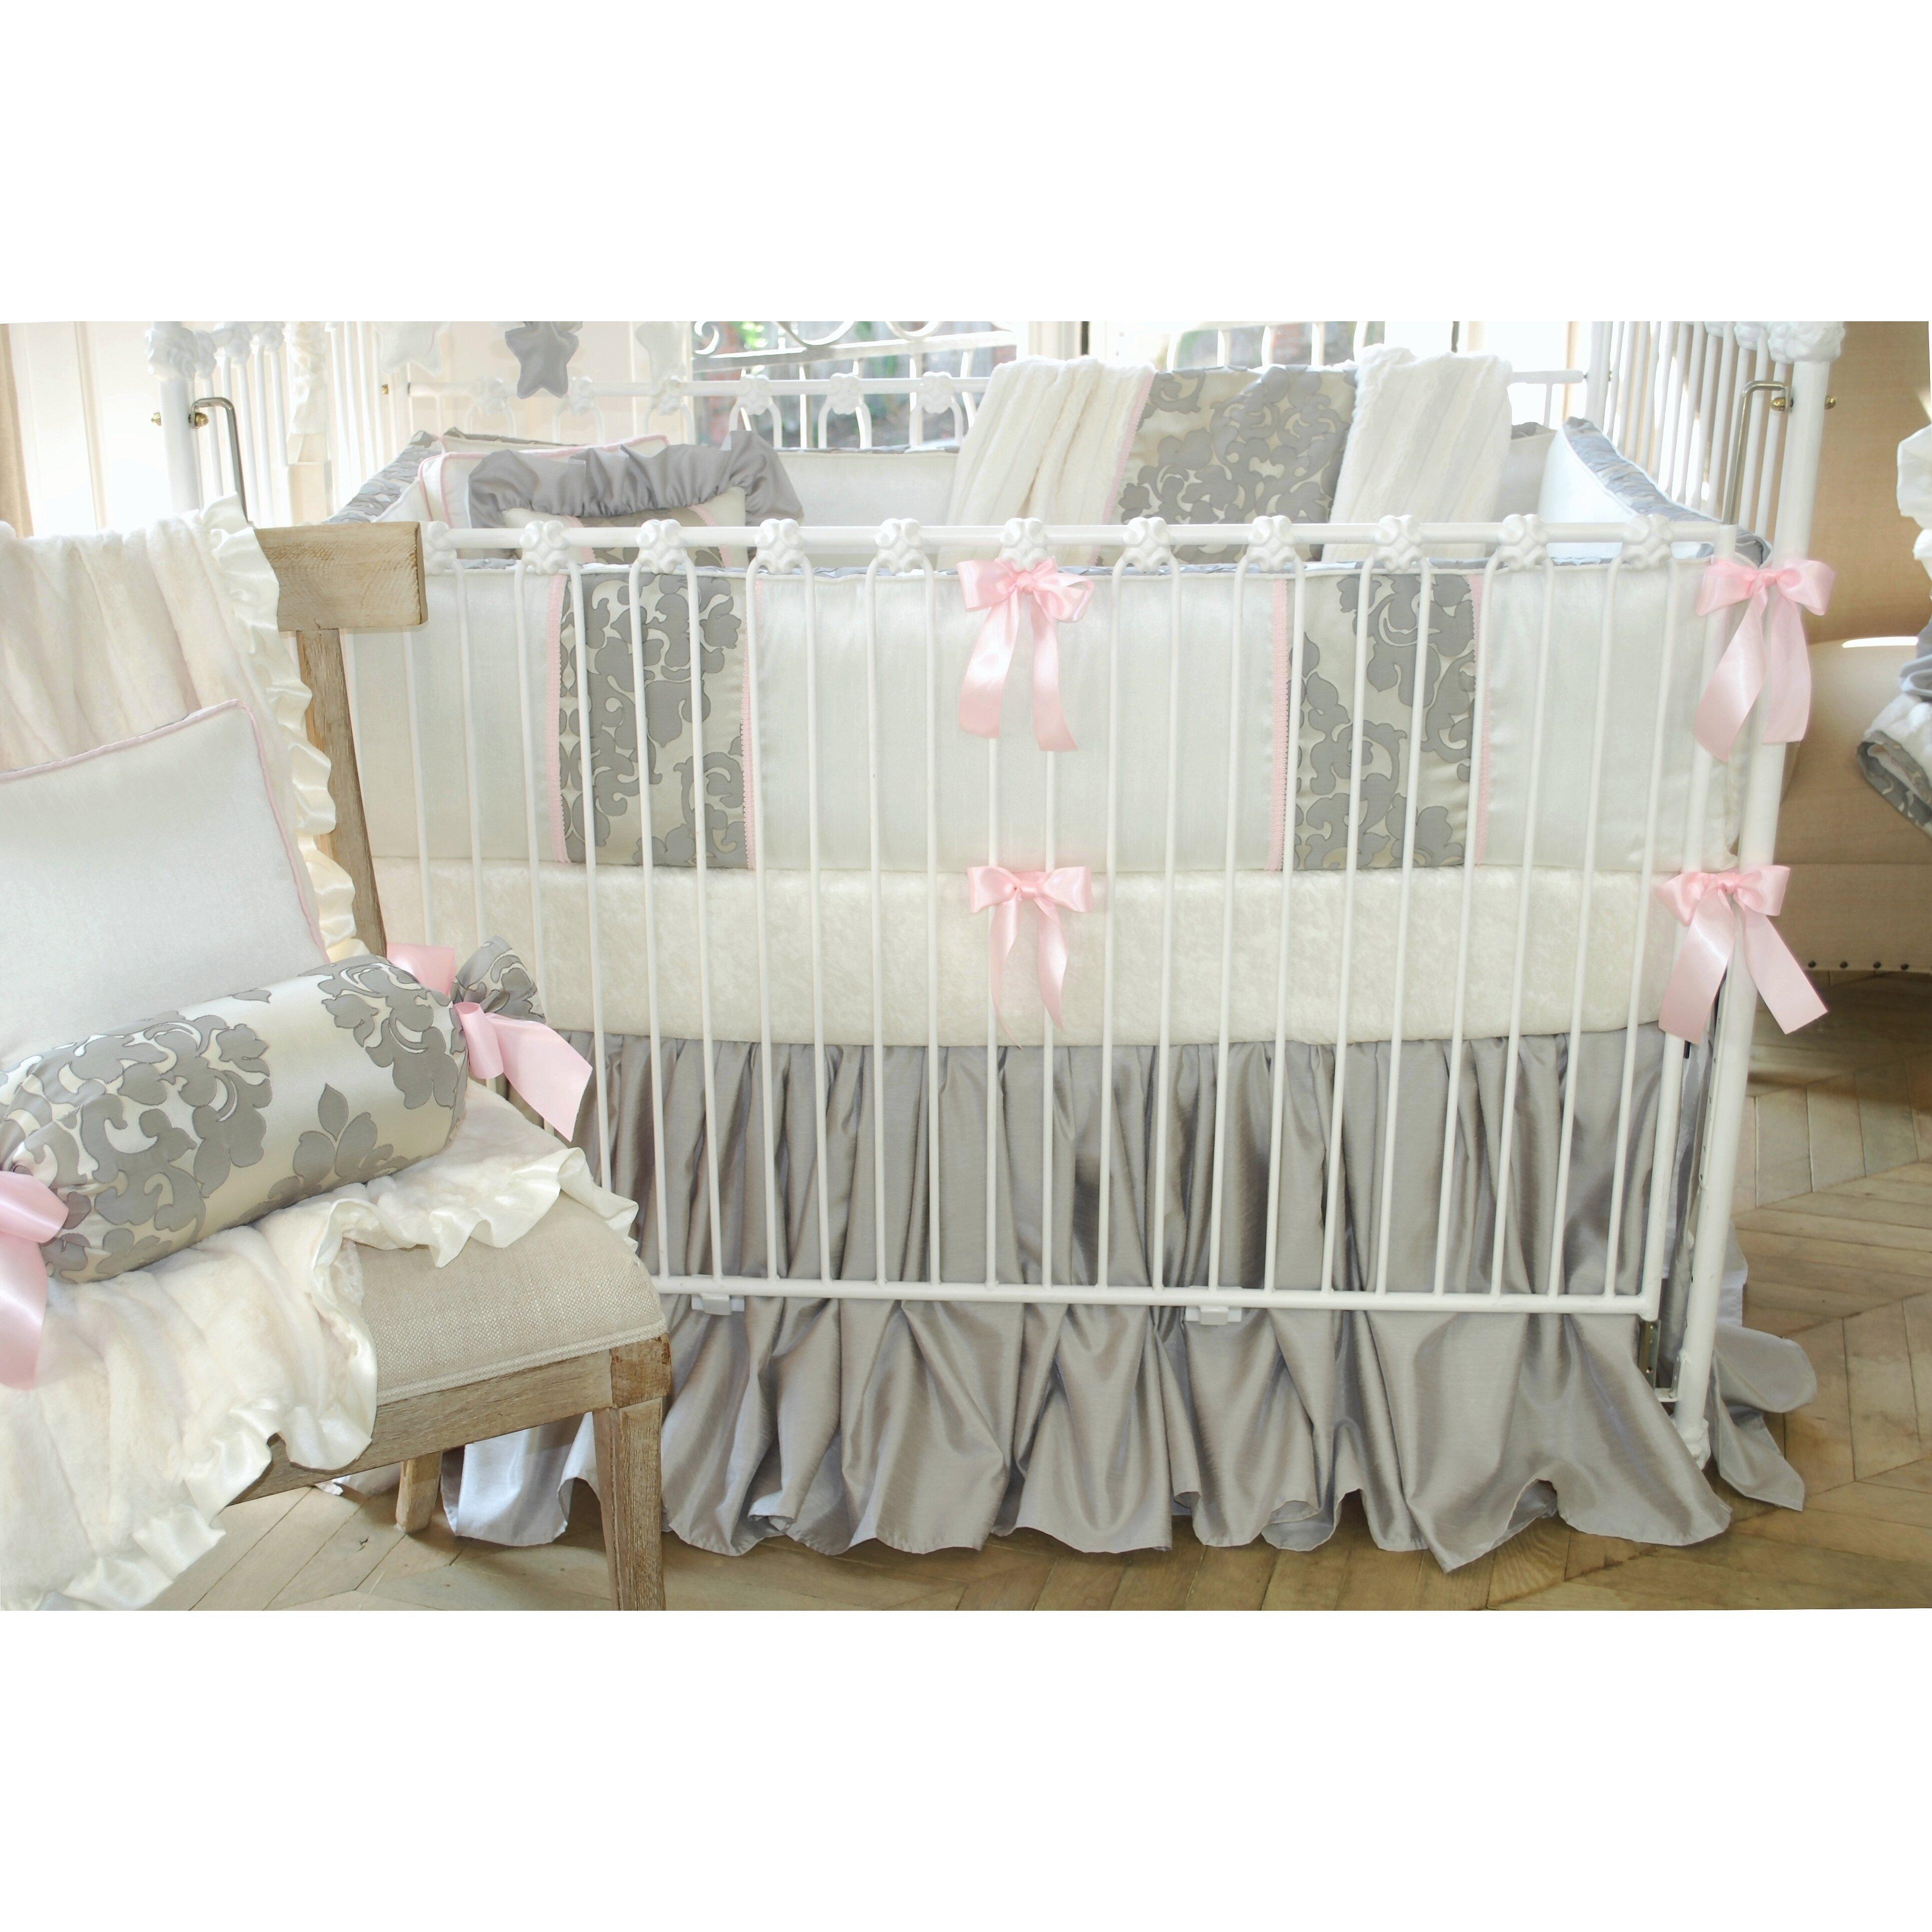 blueberrie kids lulu 4 piece crib bedding set wayfair. Black Bedroom Furniture Sets. Home Design Ideas